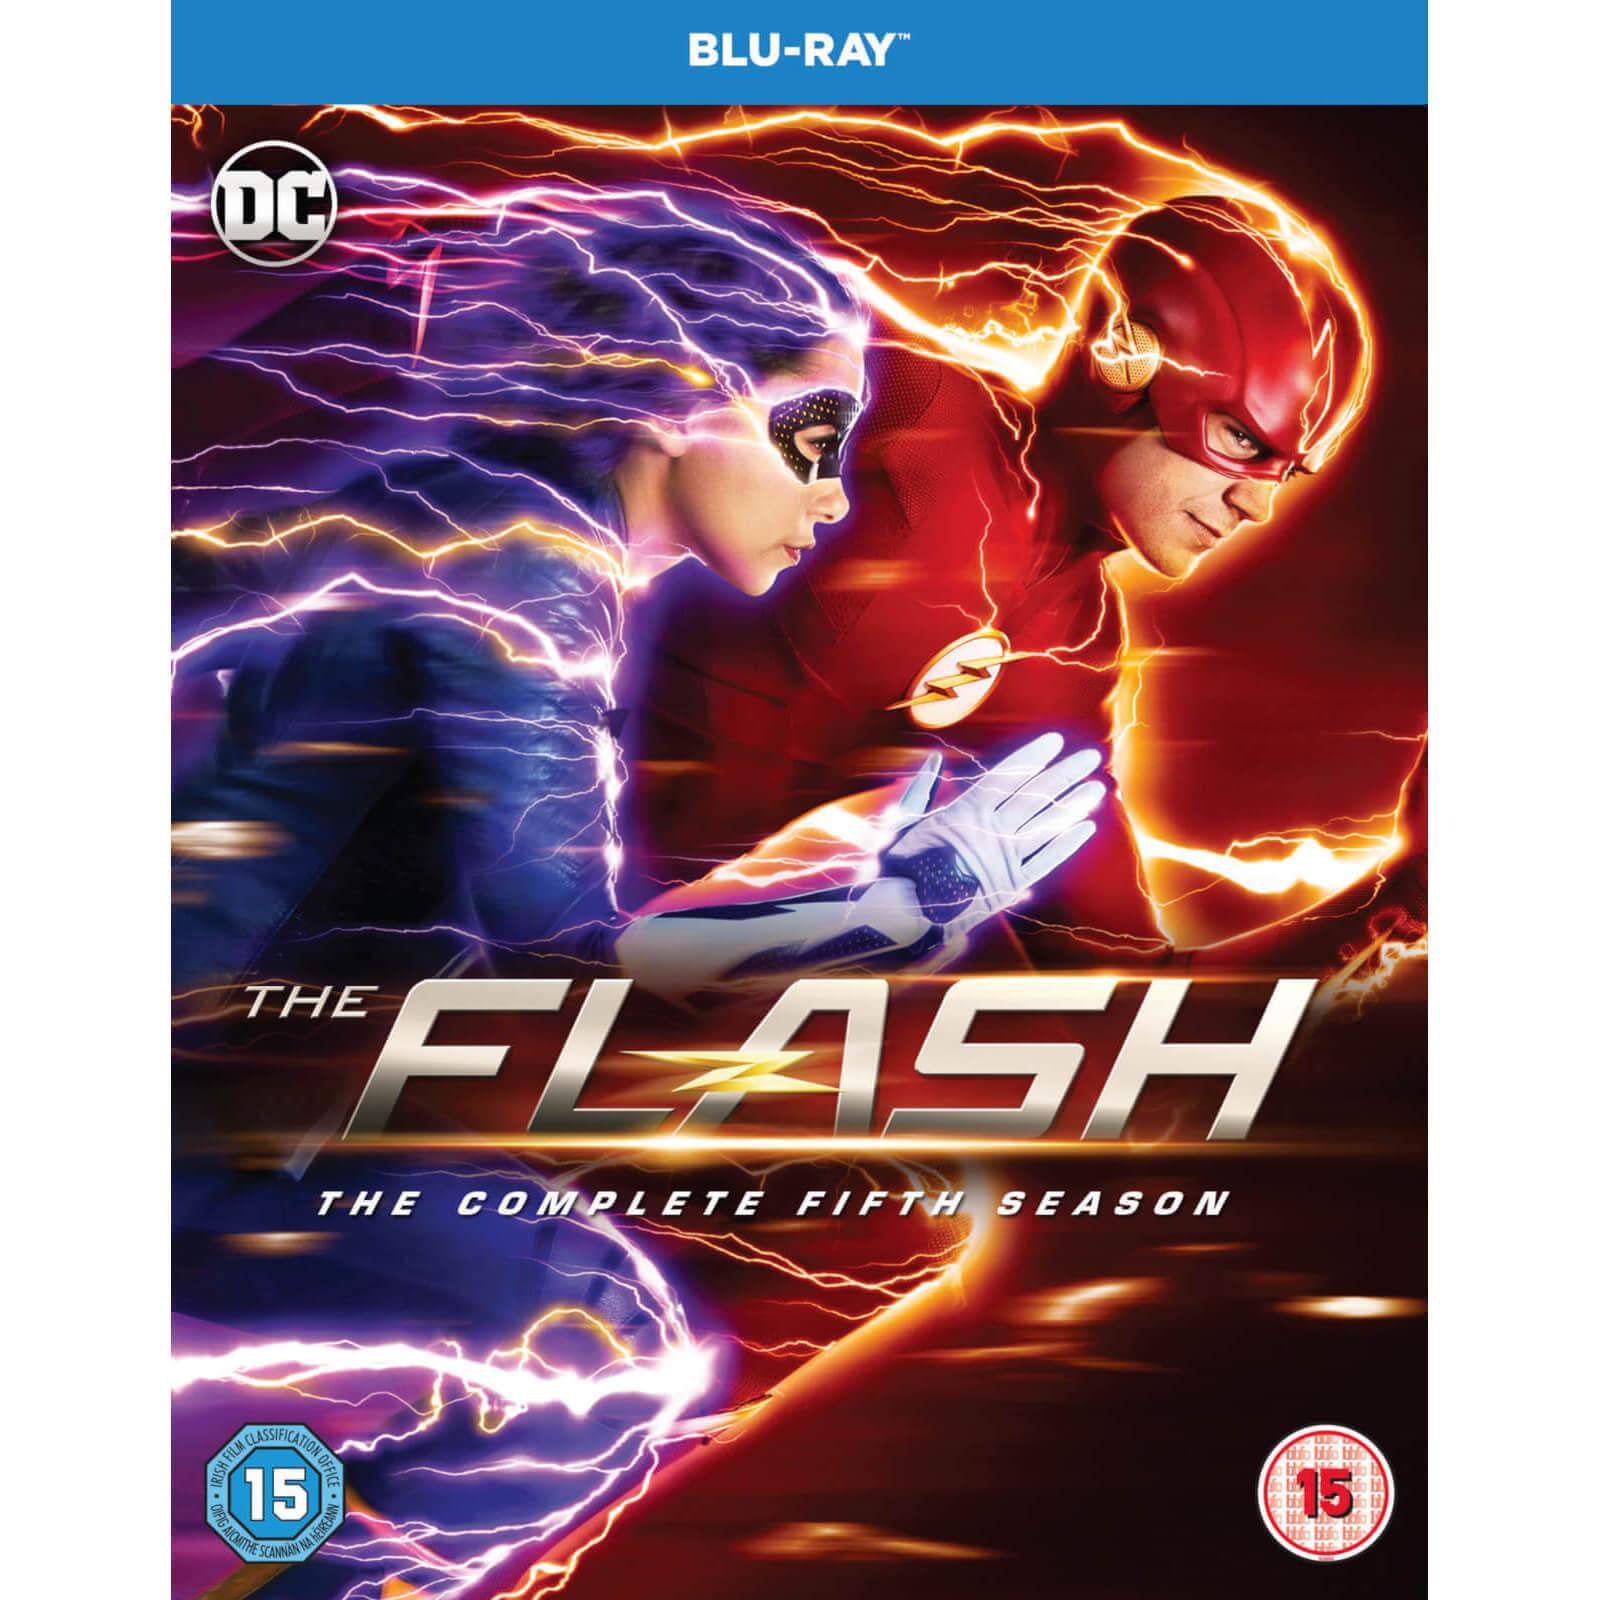 The Flash - Season 5